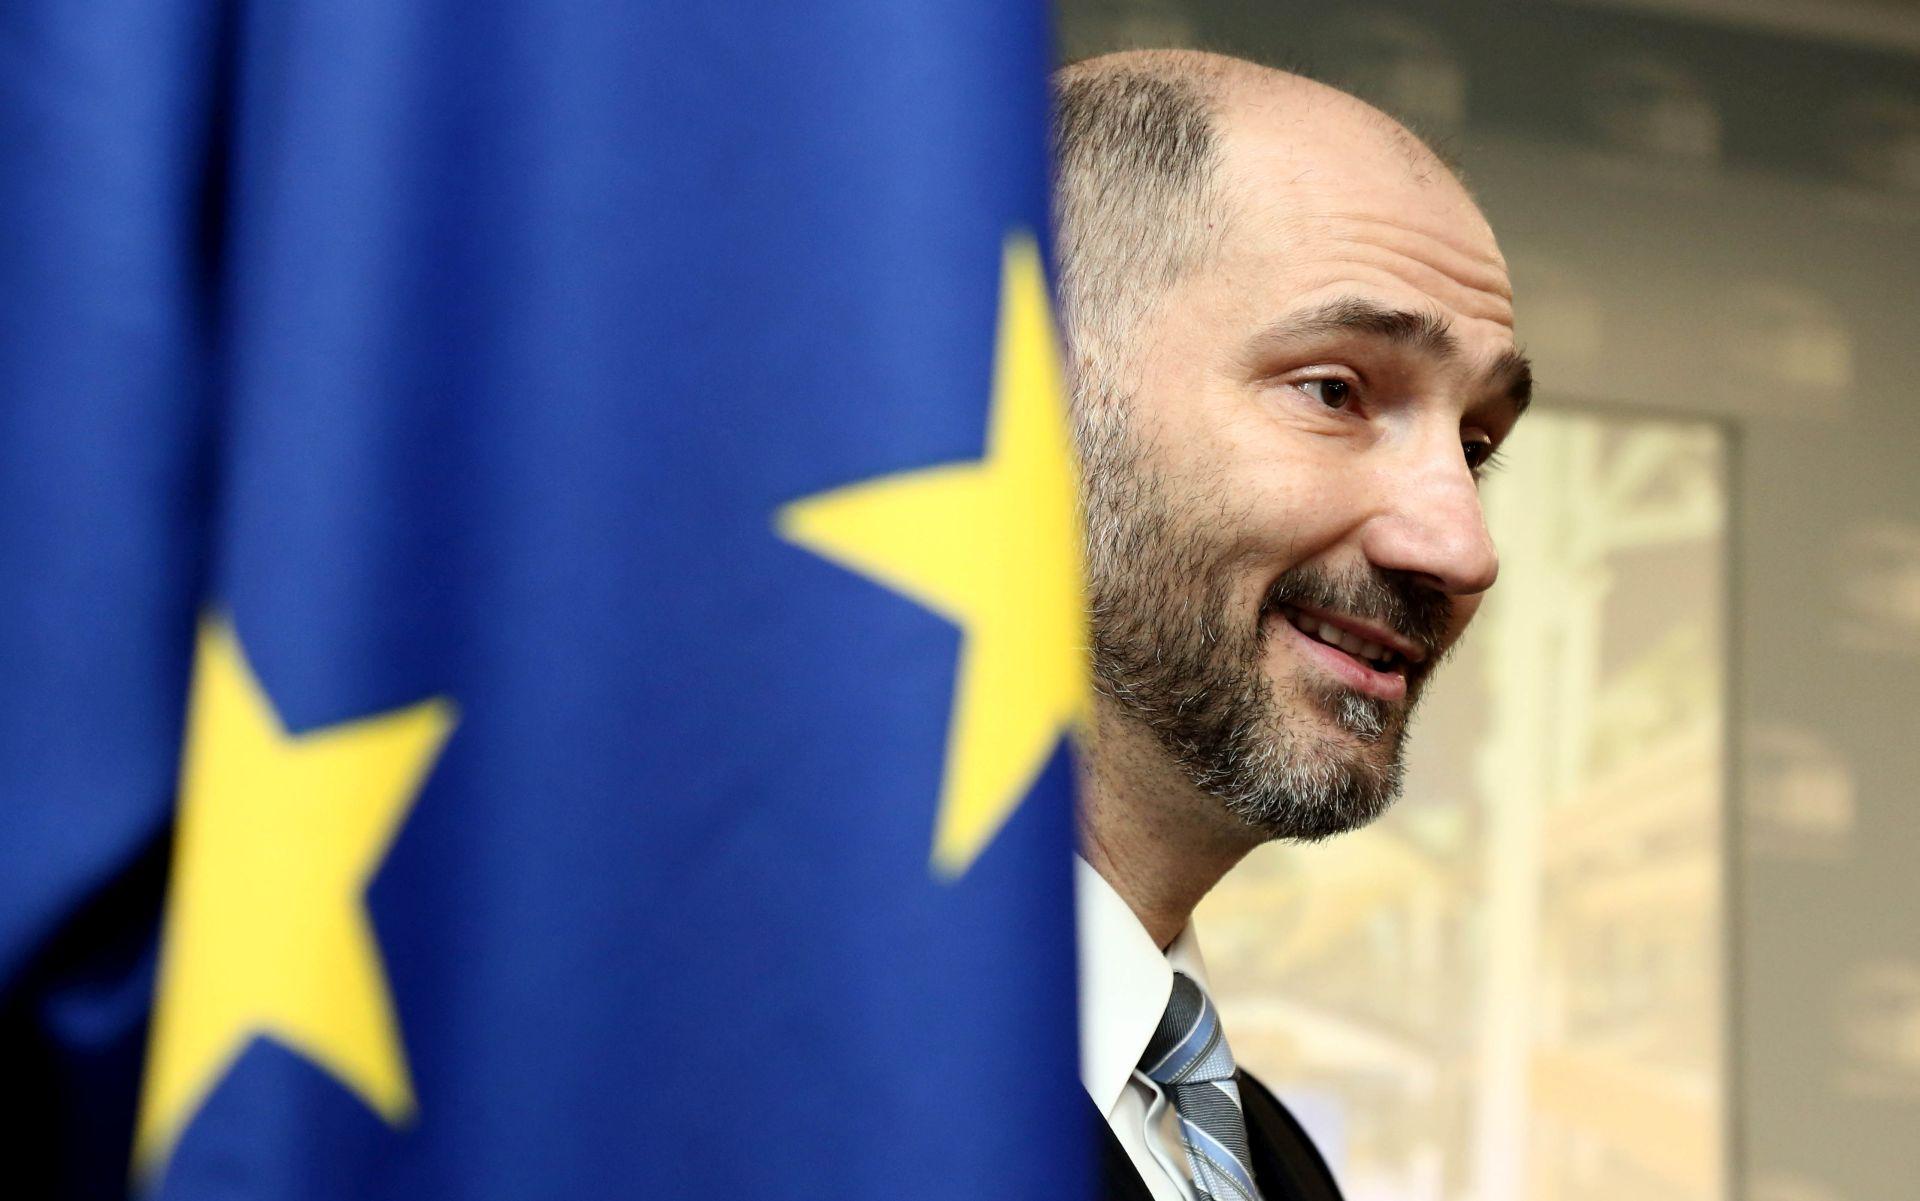 'Plenković se istovremeno bori na tri fronte'